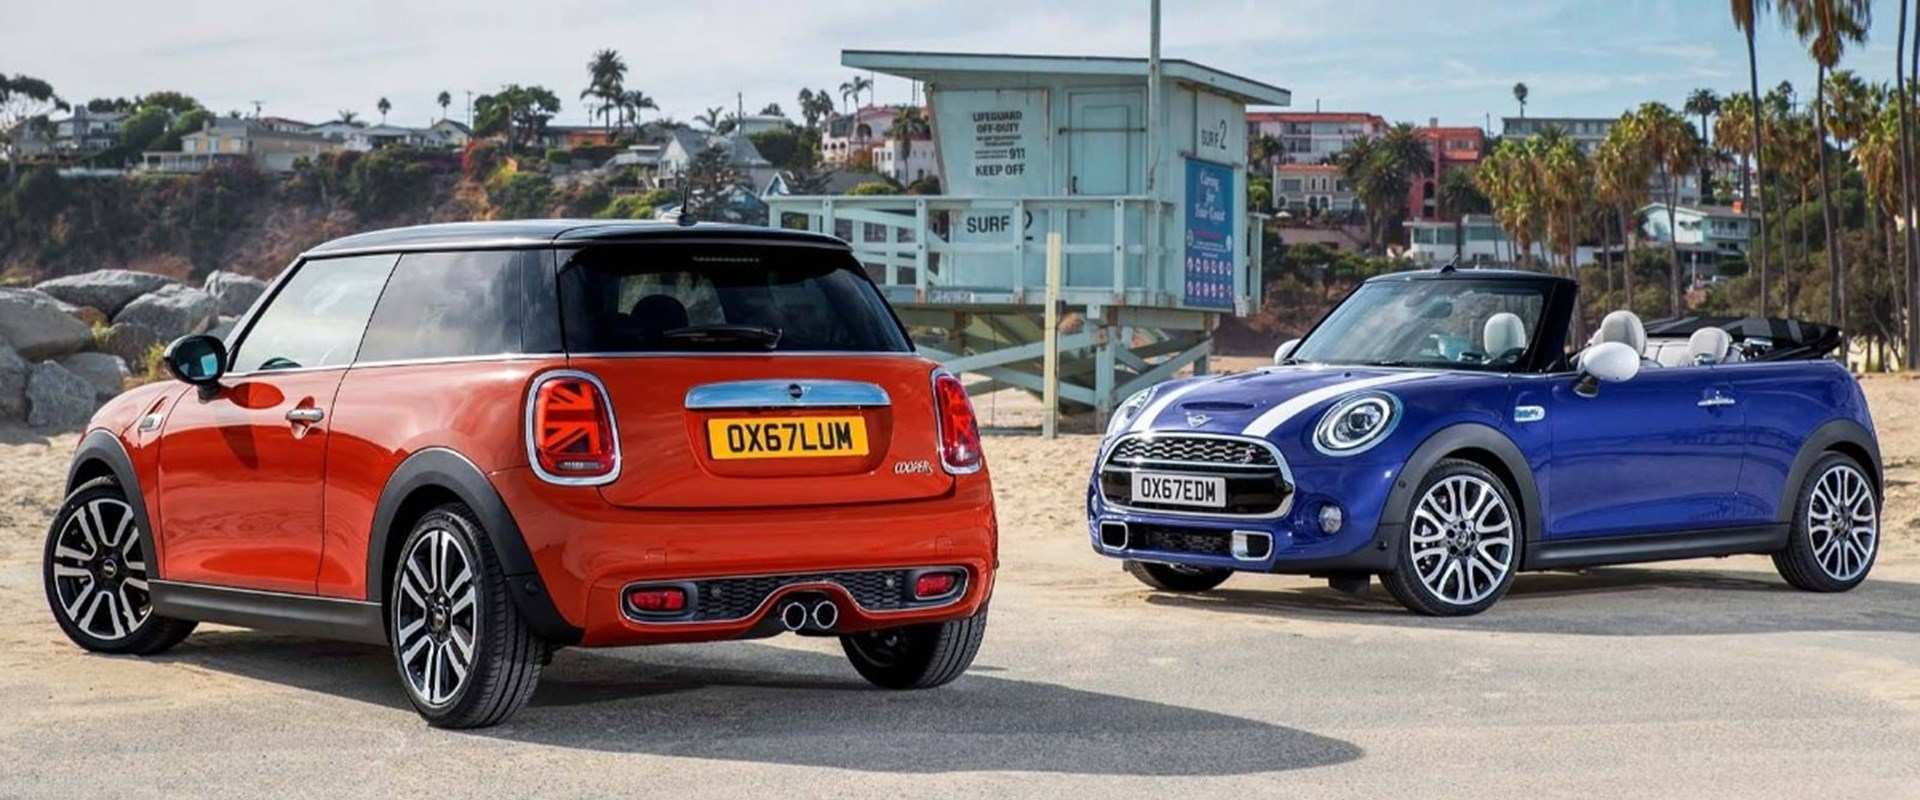 91 New Mini 2019 Facelift Reviews by Mini 2019 Facelift